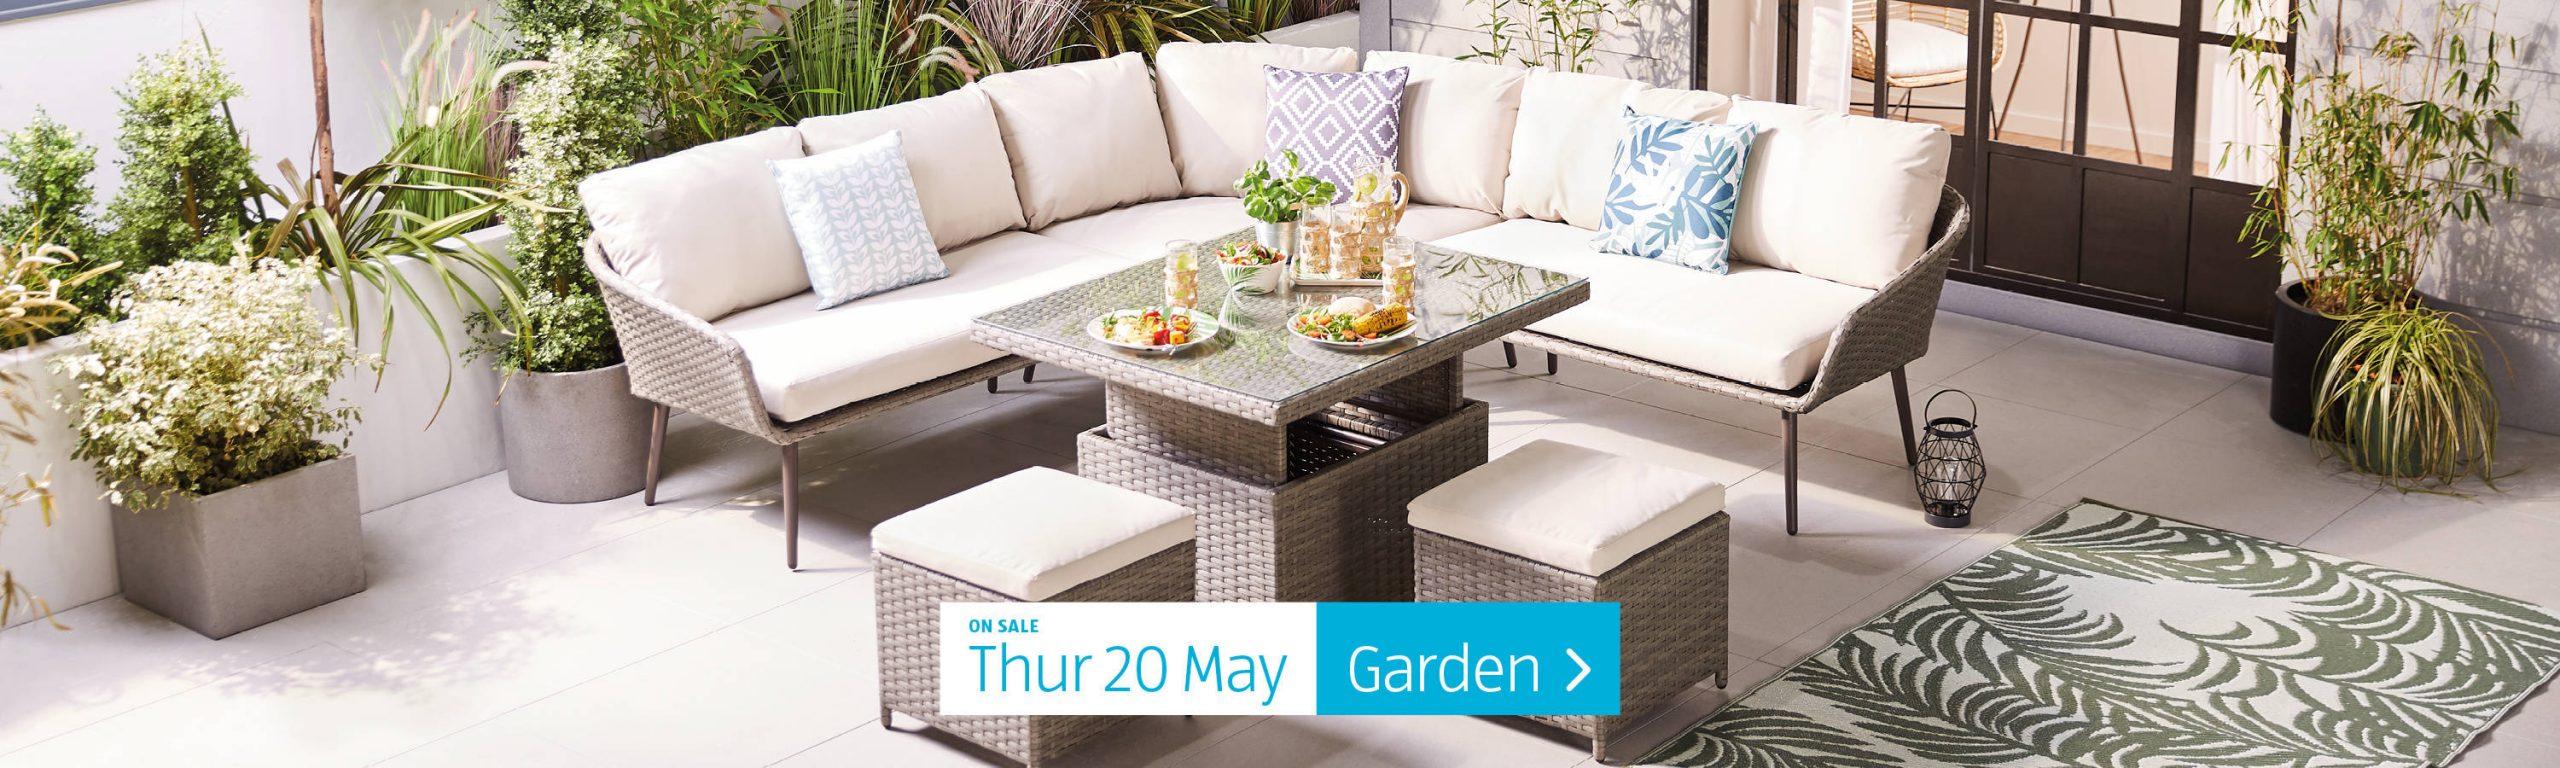 ALDI Thursday Offers Garden 20th May 2021